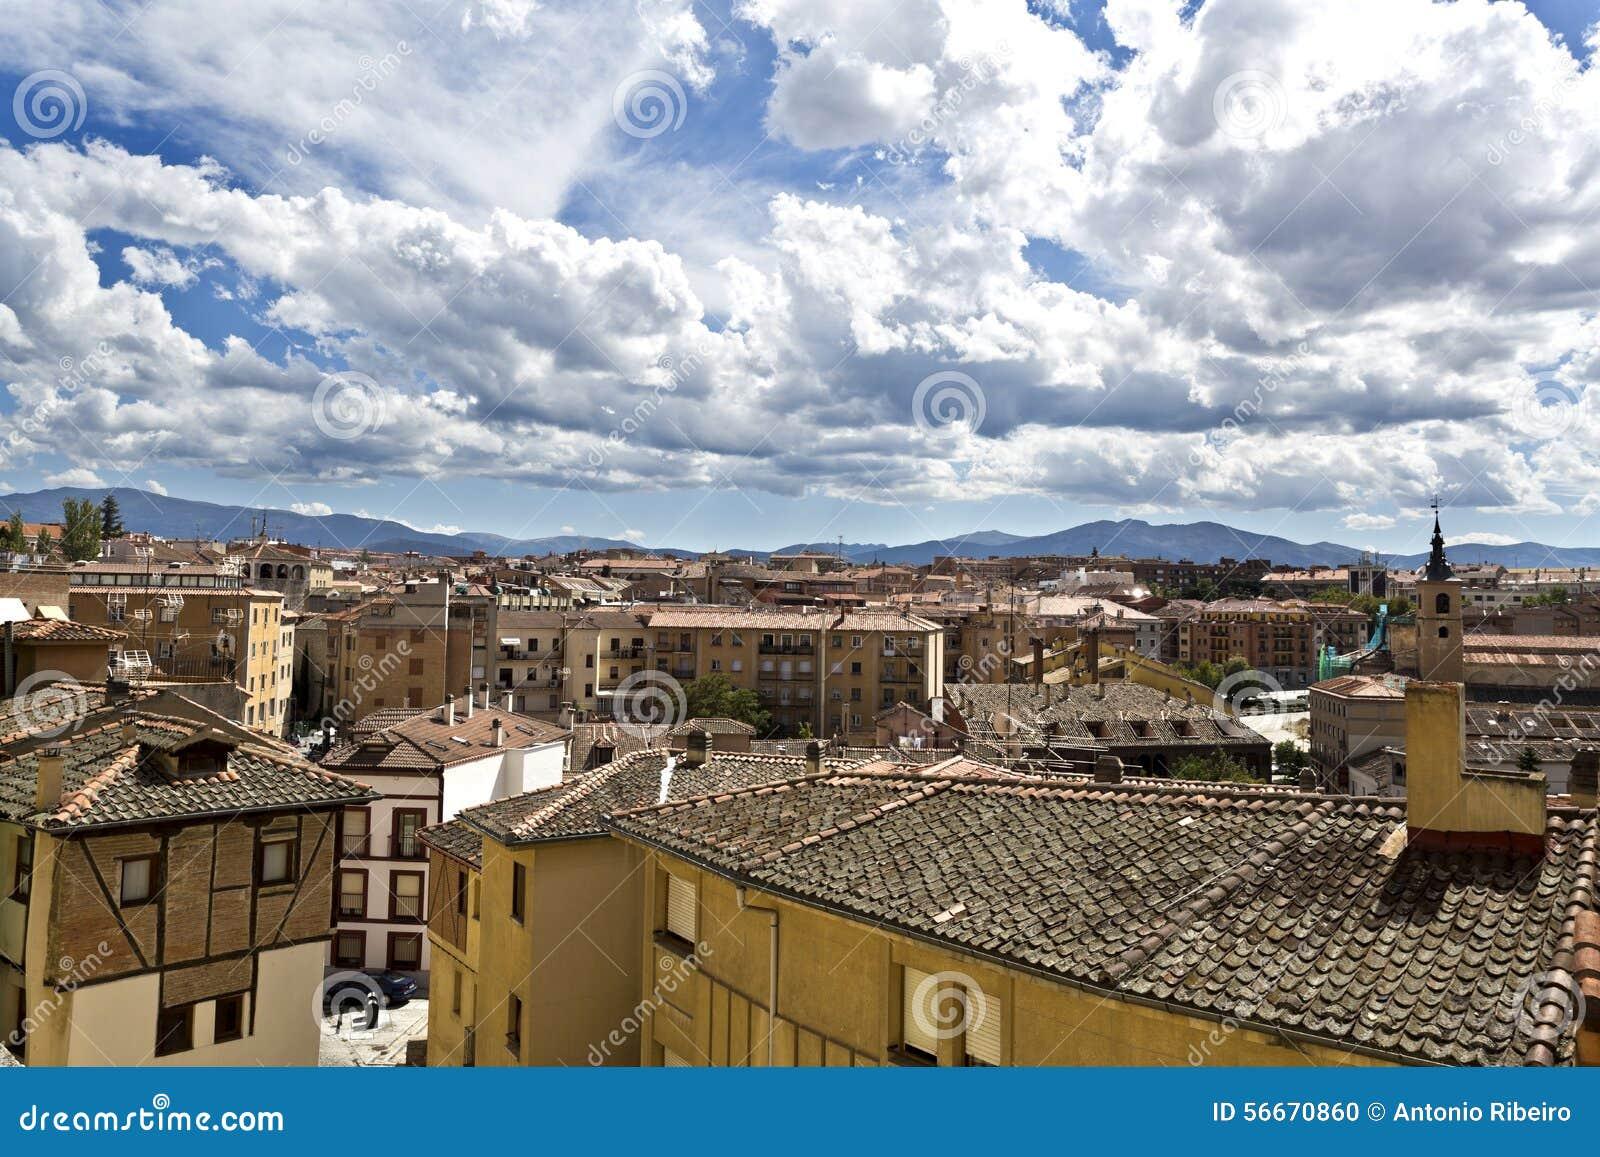 Segovia Old City stock photo Image of city background 56670860